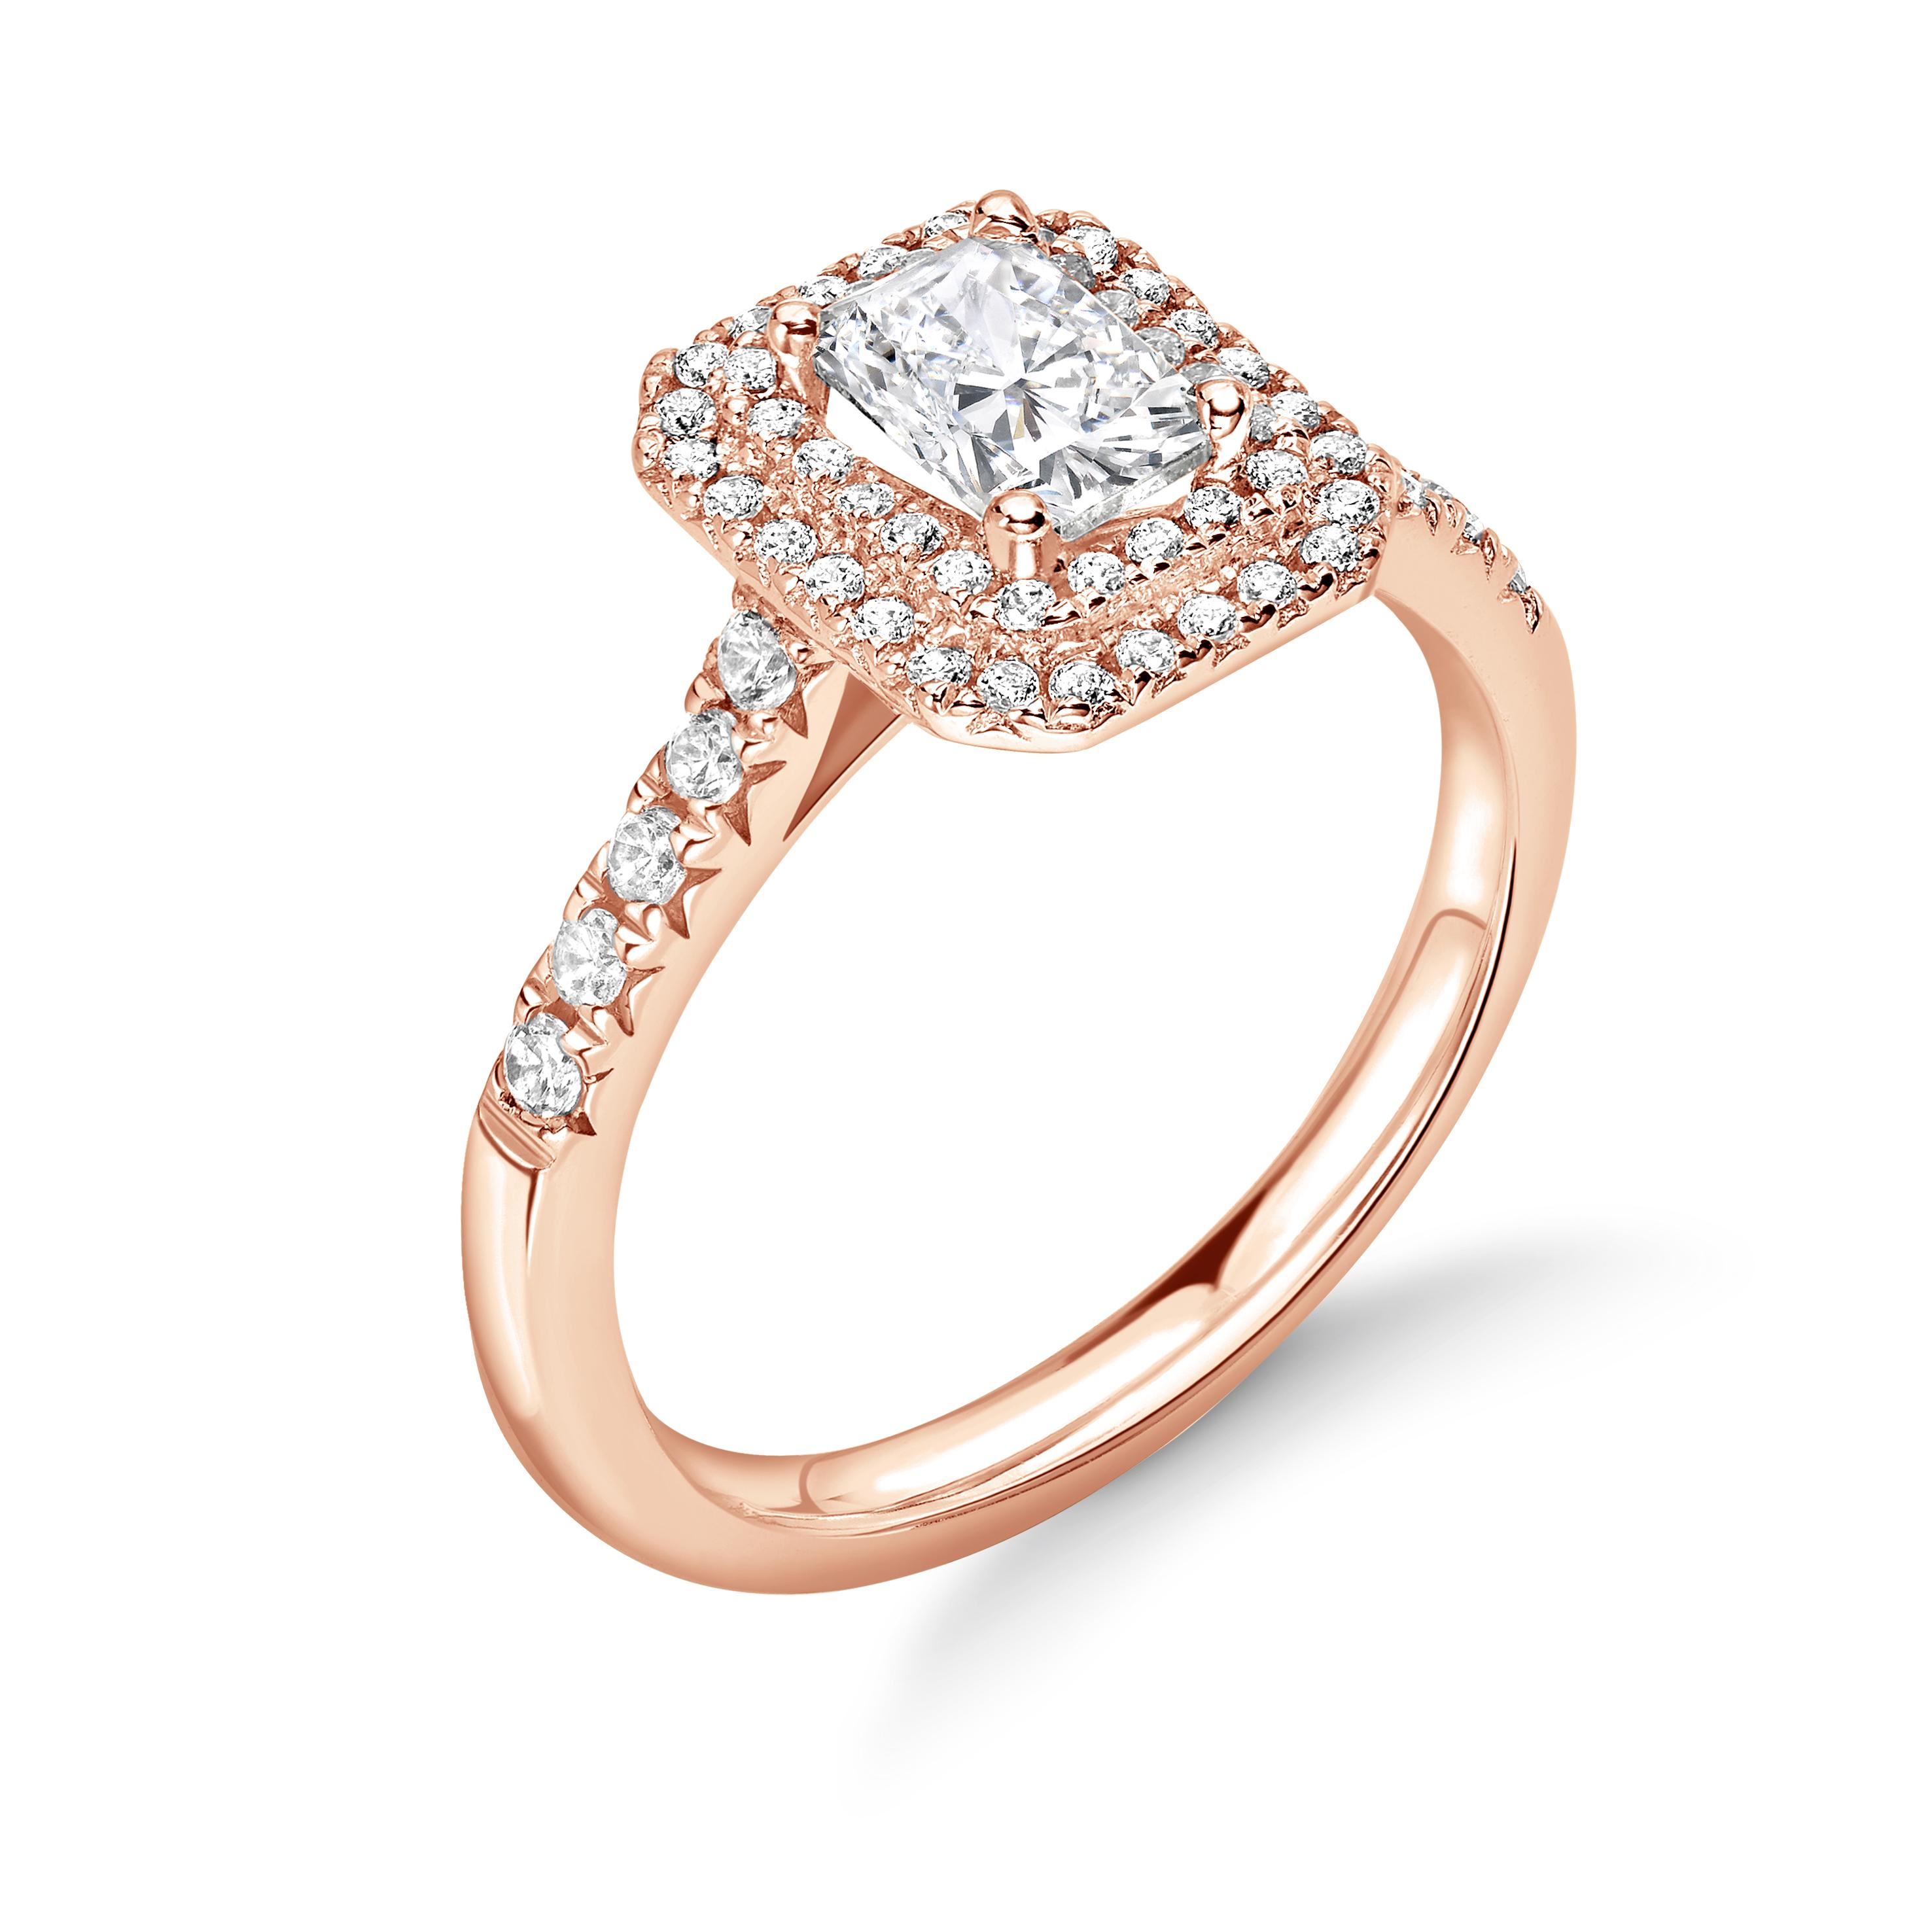 4 Prong Setting Radiant Shape two Raw Halo Diamond Engagement Rings